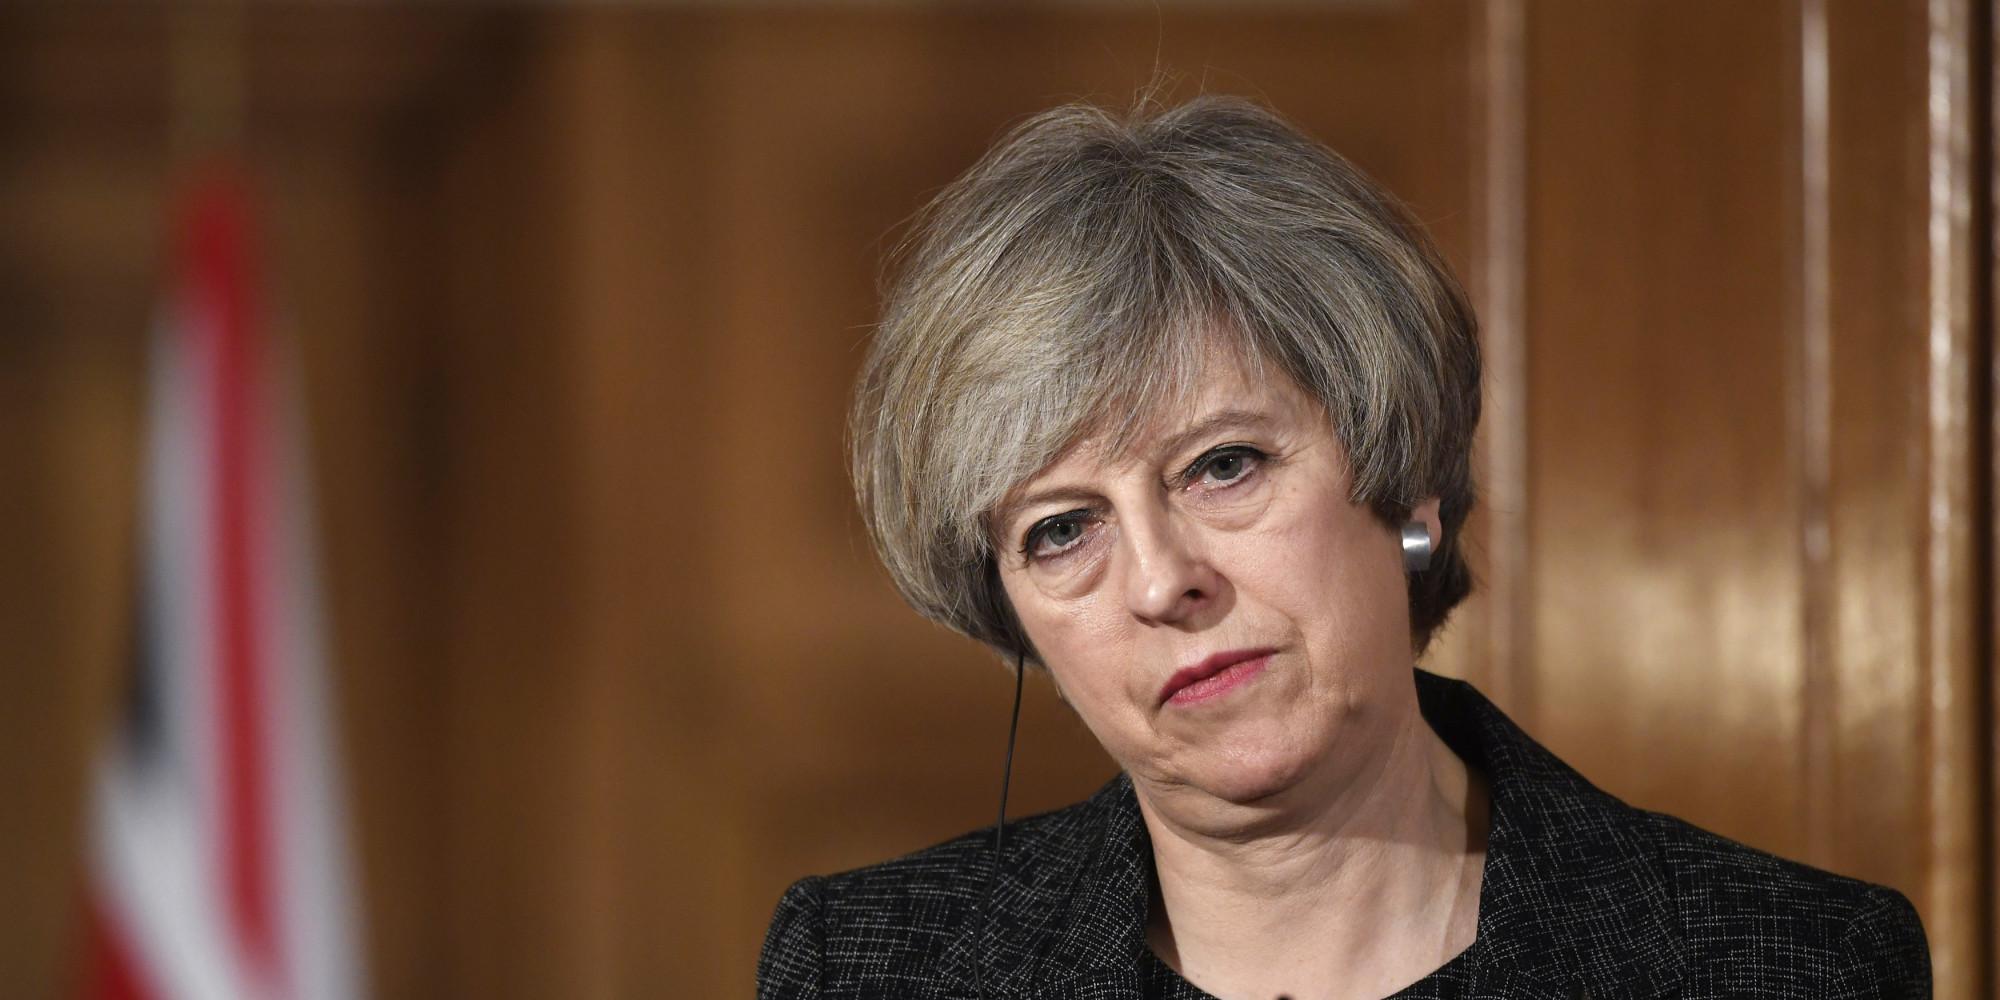 Is Theresa May Turning Into Donald Trump? | HuffPost UK